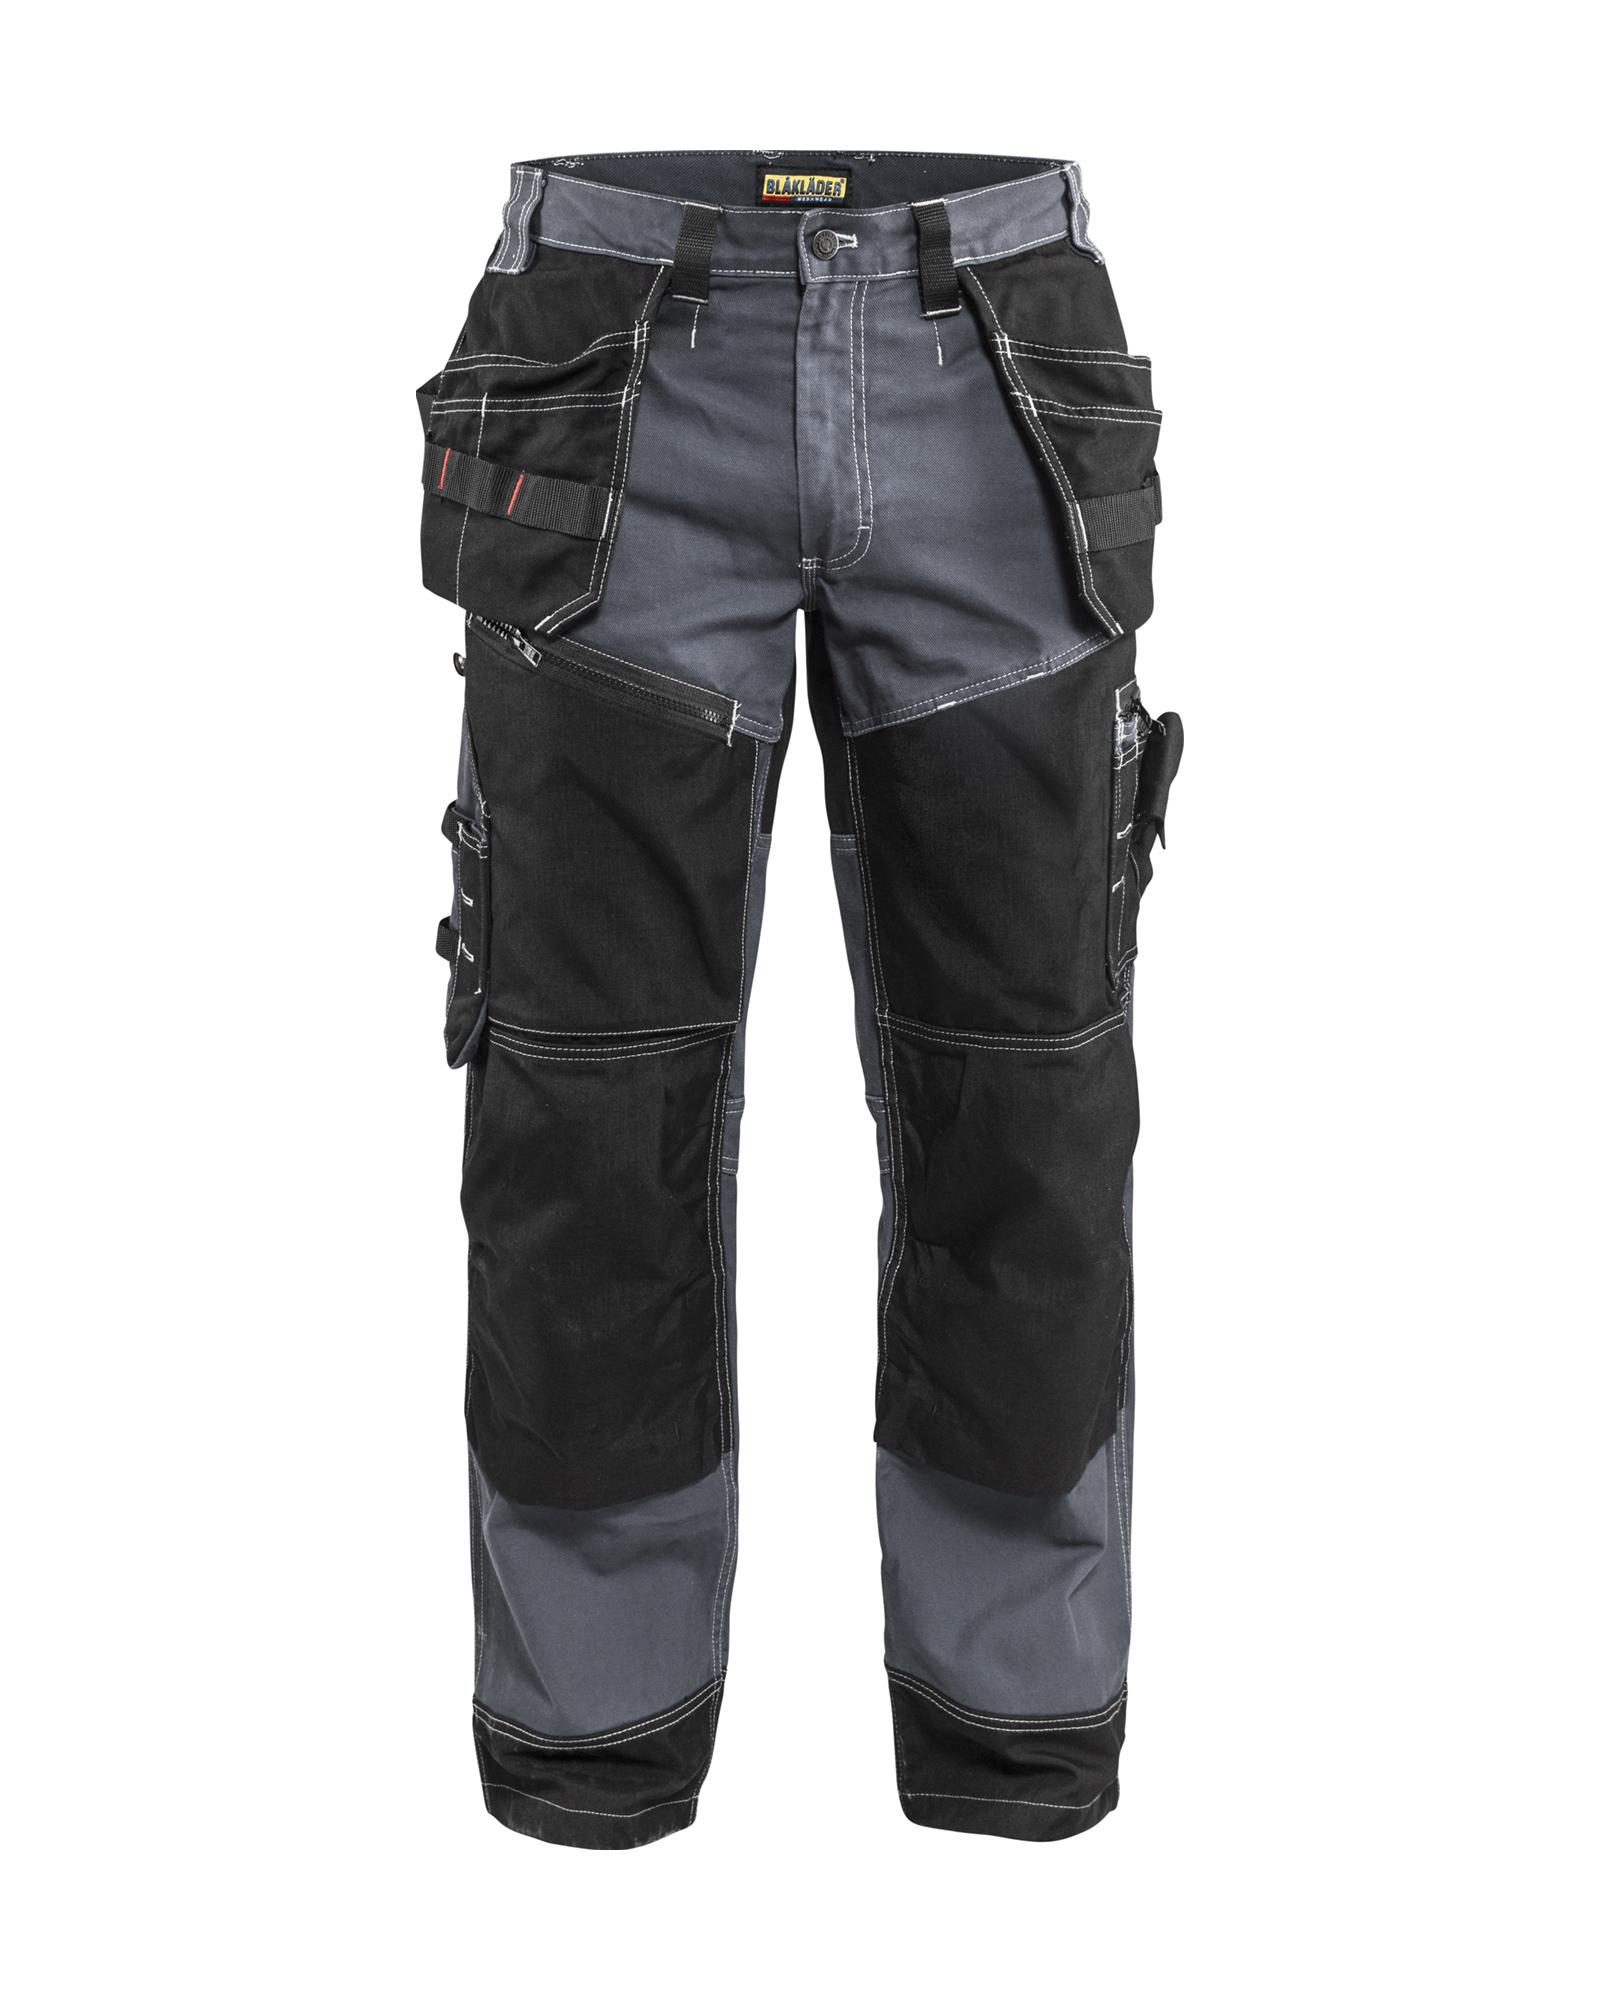 X1600 Work Pants Trousers 16001370 Blaklader